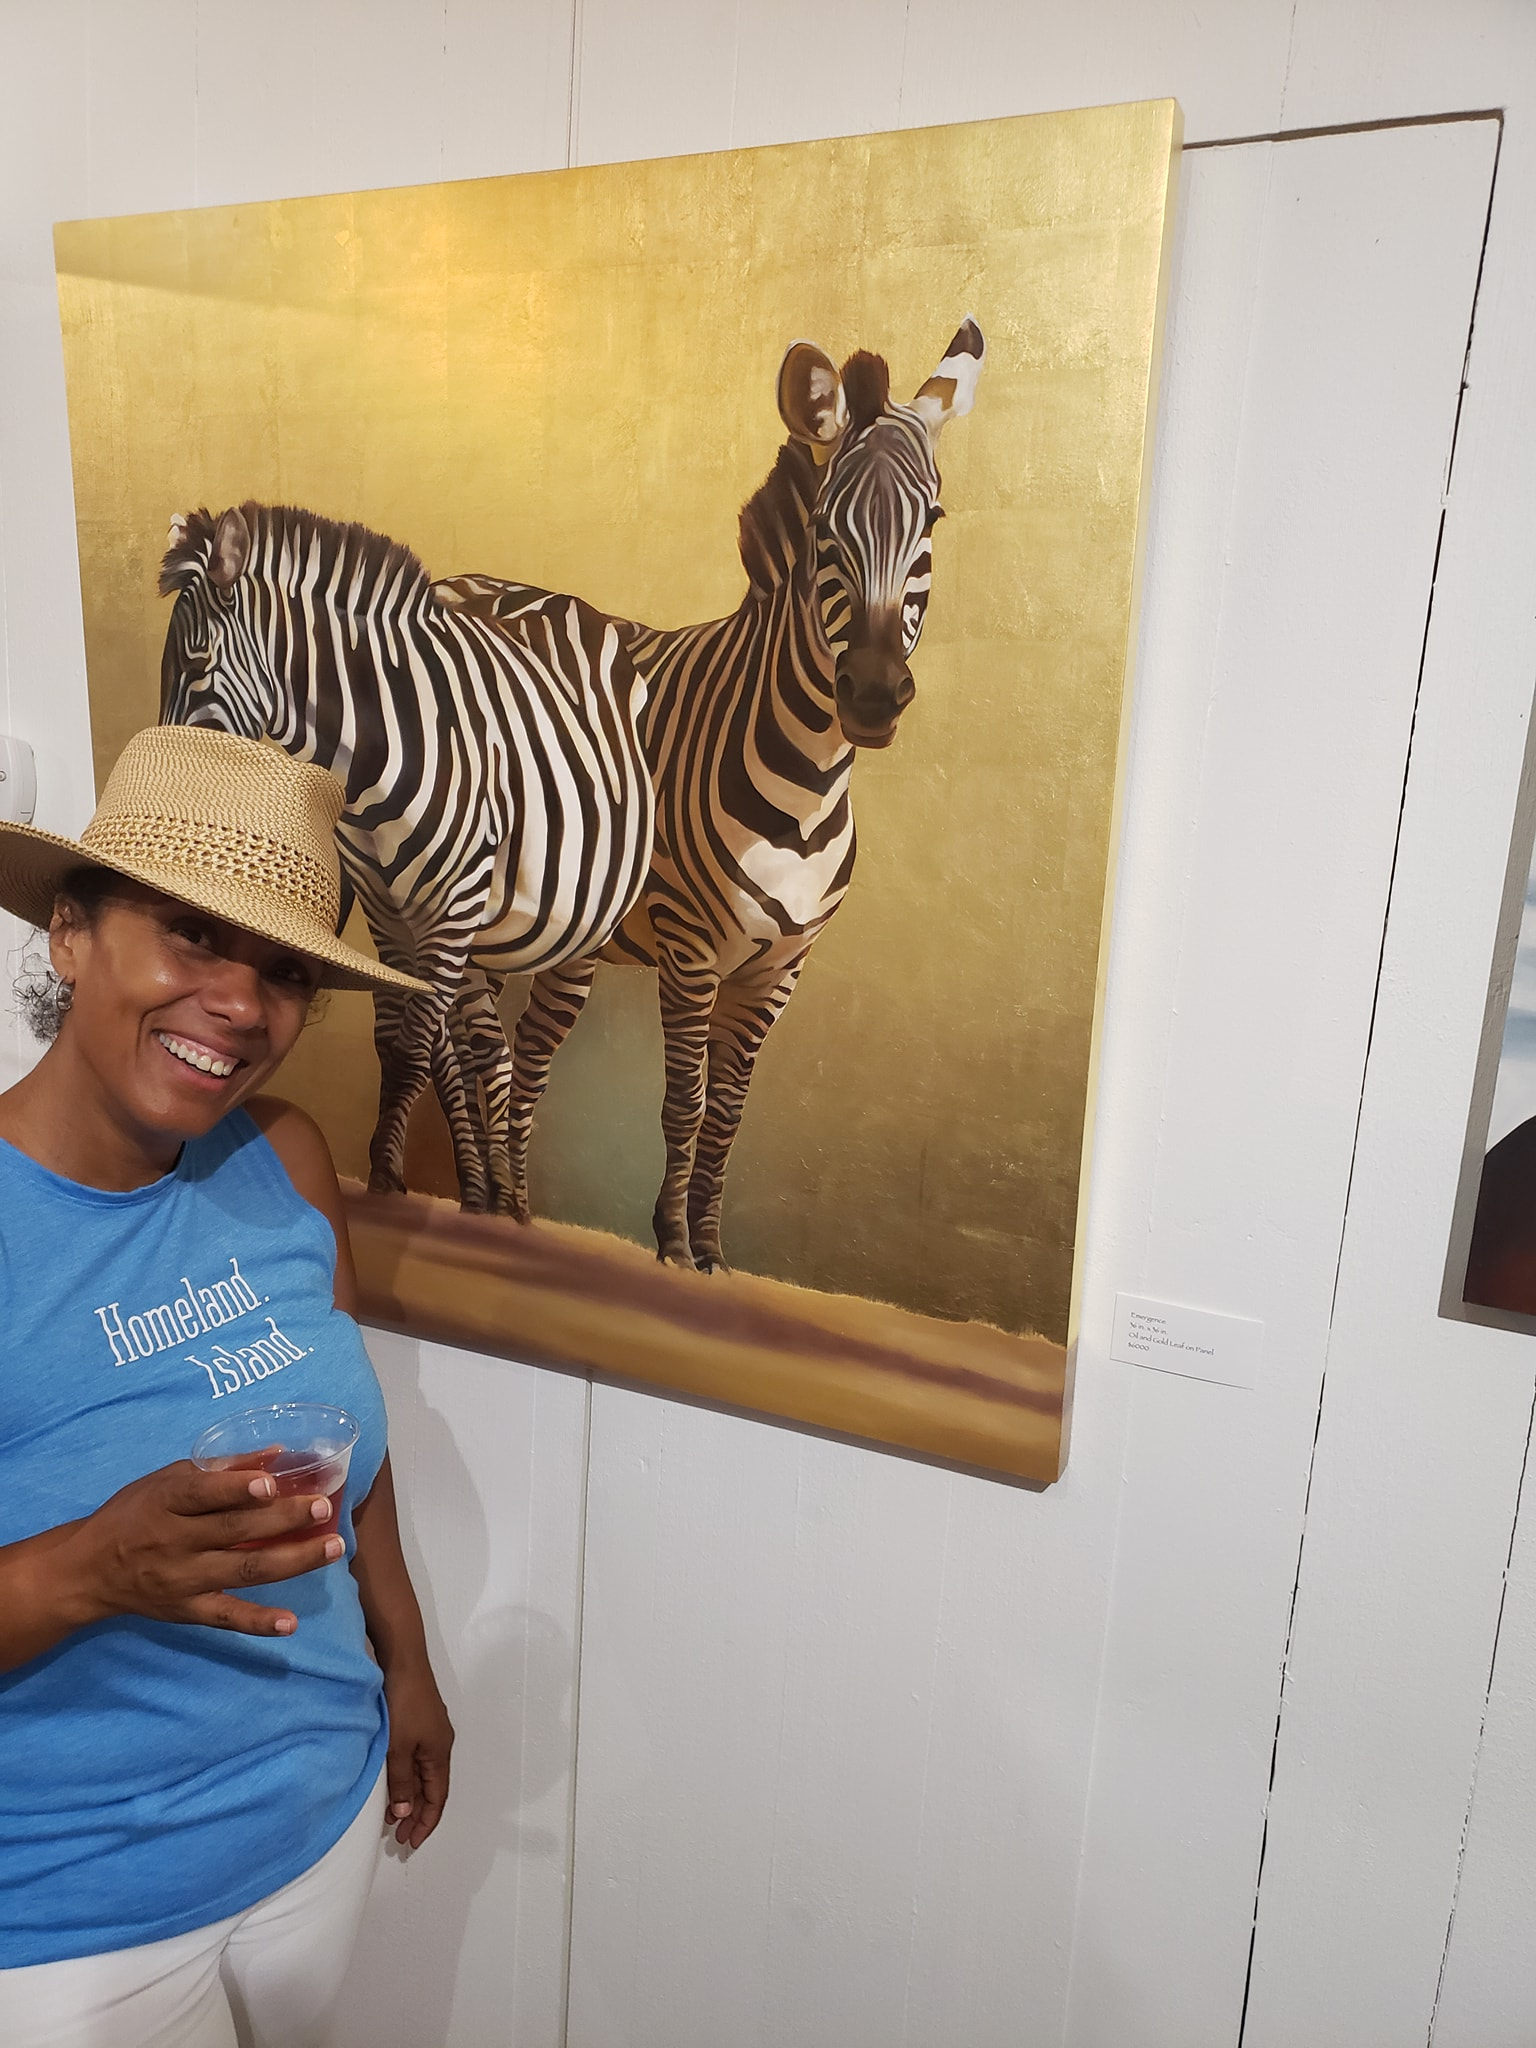 Kahina Van Dyke, Owner & Innkeeper, Narragansett House B&B,  https://narragansetthouse.com/ , Oak Bluffs, Martha's Vineyard, MA